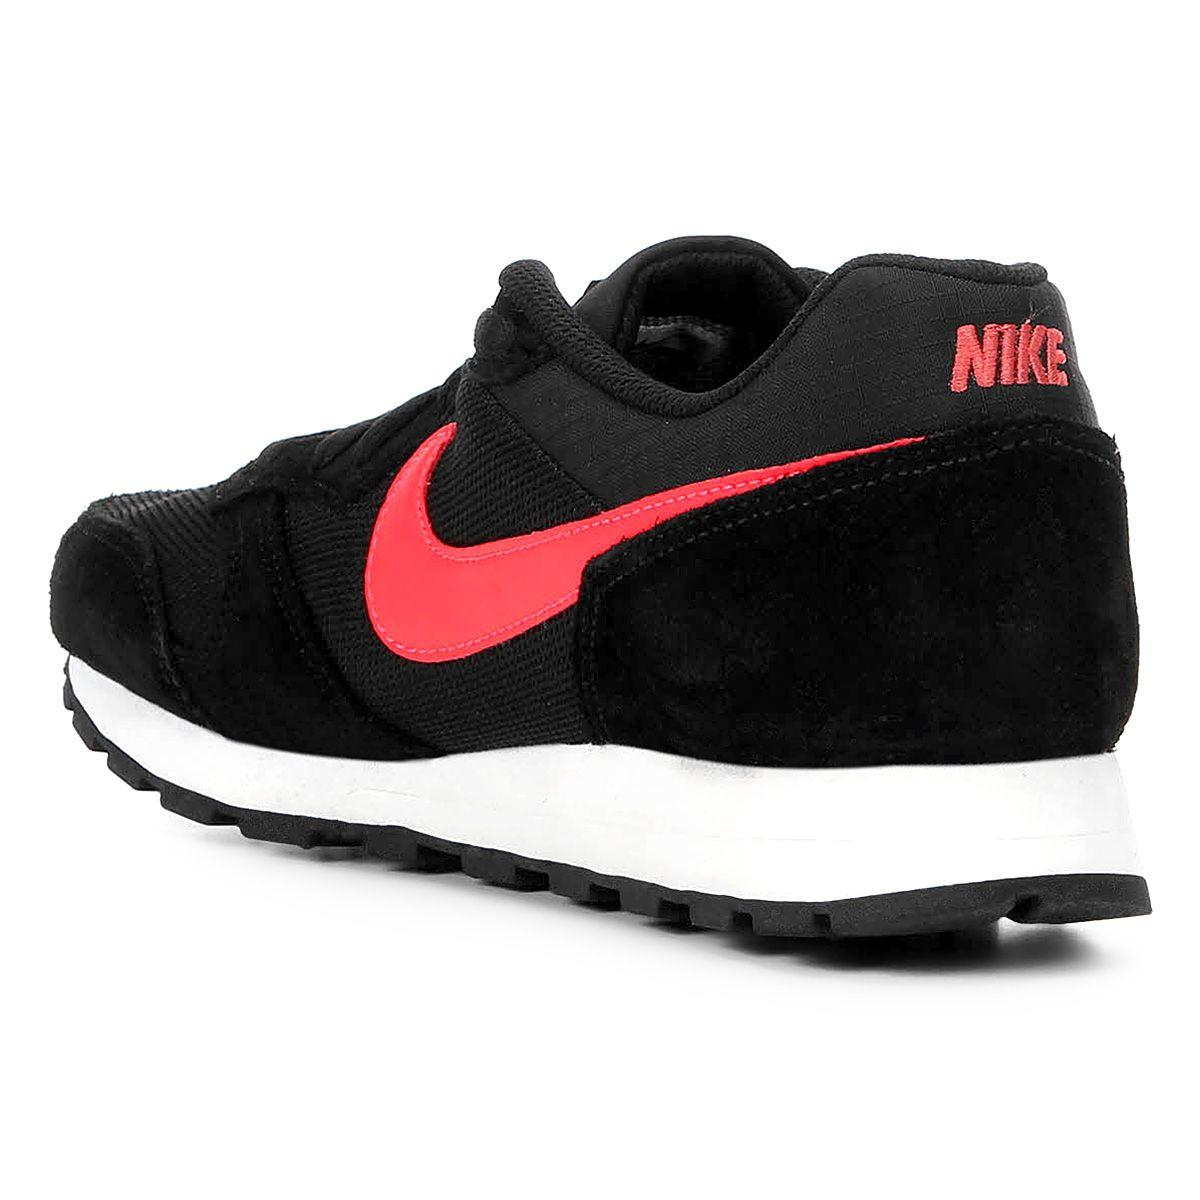 b27393f509 Tênis Nike Md Runner 2 Masculino - Preto e Vermelho - Tênis de ...